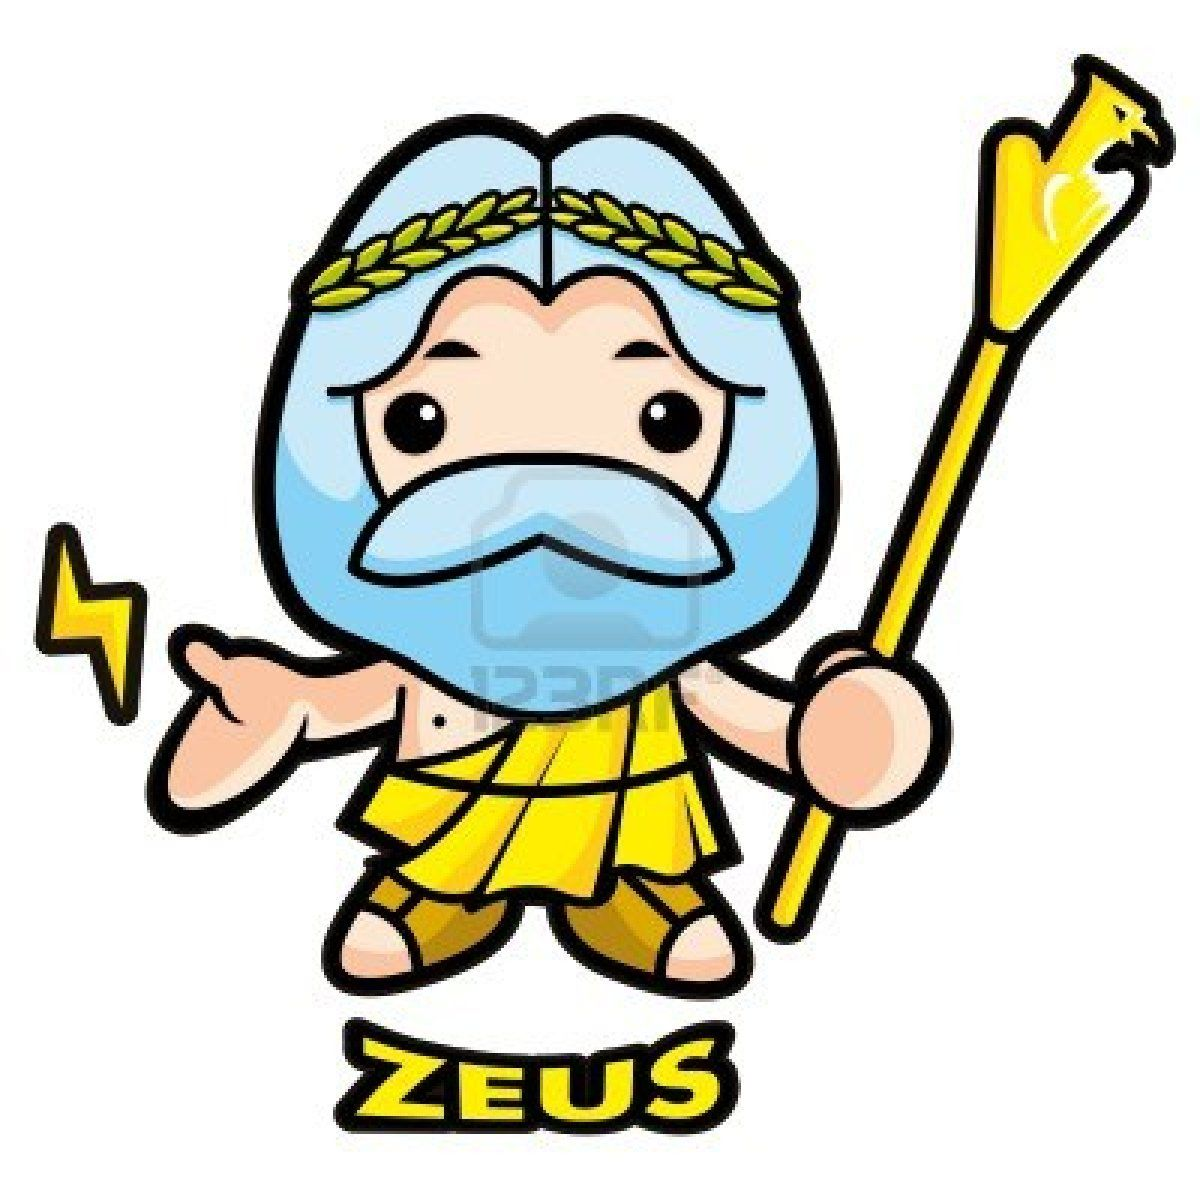 zeus cartoon info pinterest cartoon and drawings rh pinterest com zeus clipart free zeus god clipart